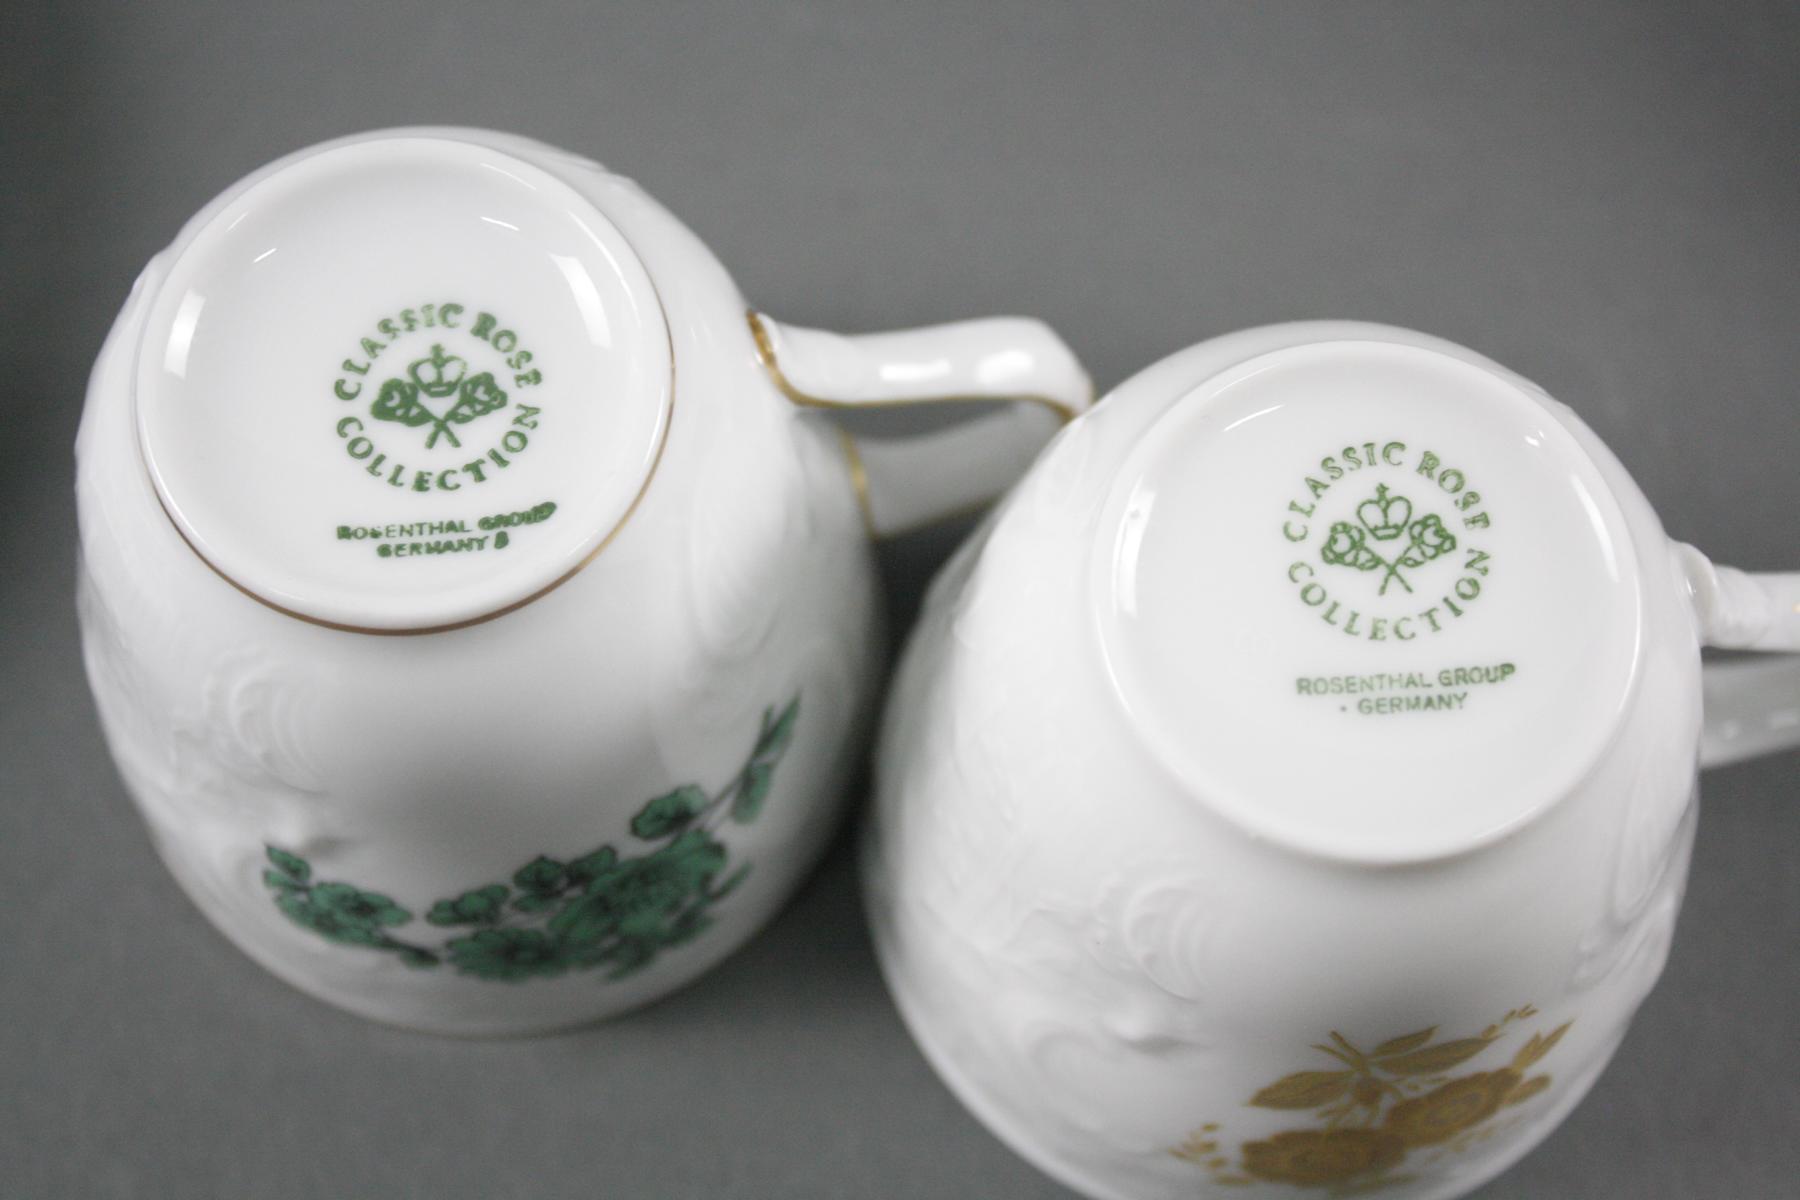 Rosenthal Kaffeeservice, Classic Rose und 4 Gedecke, Sanssouci-2